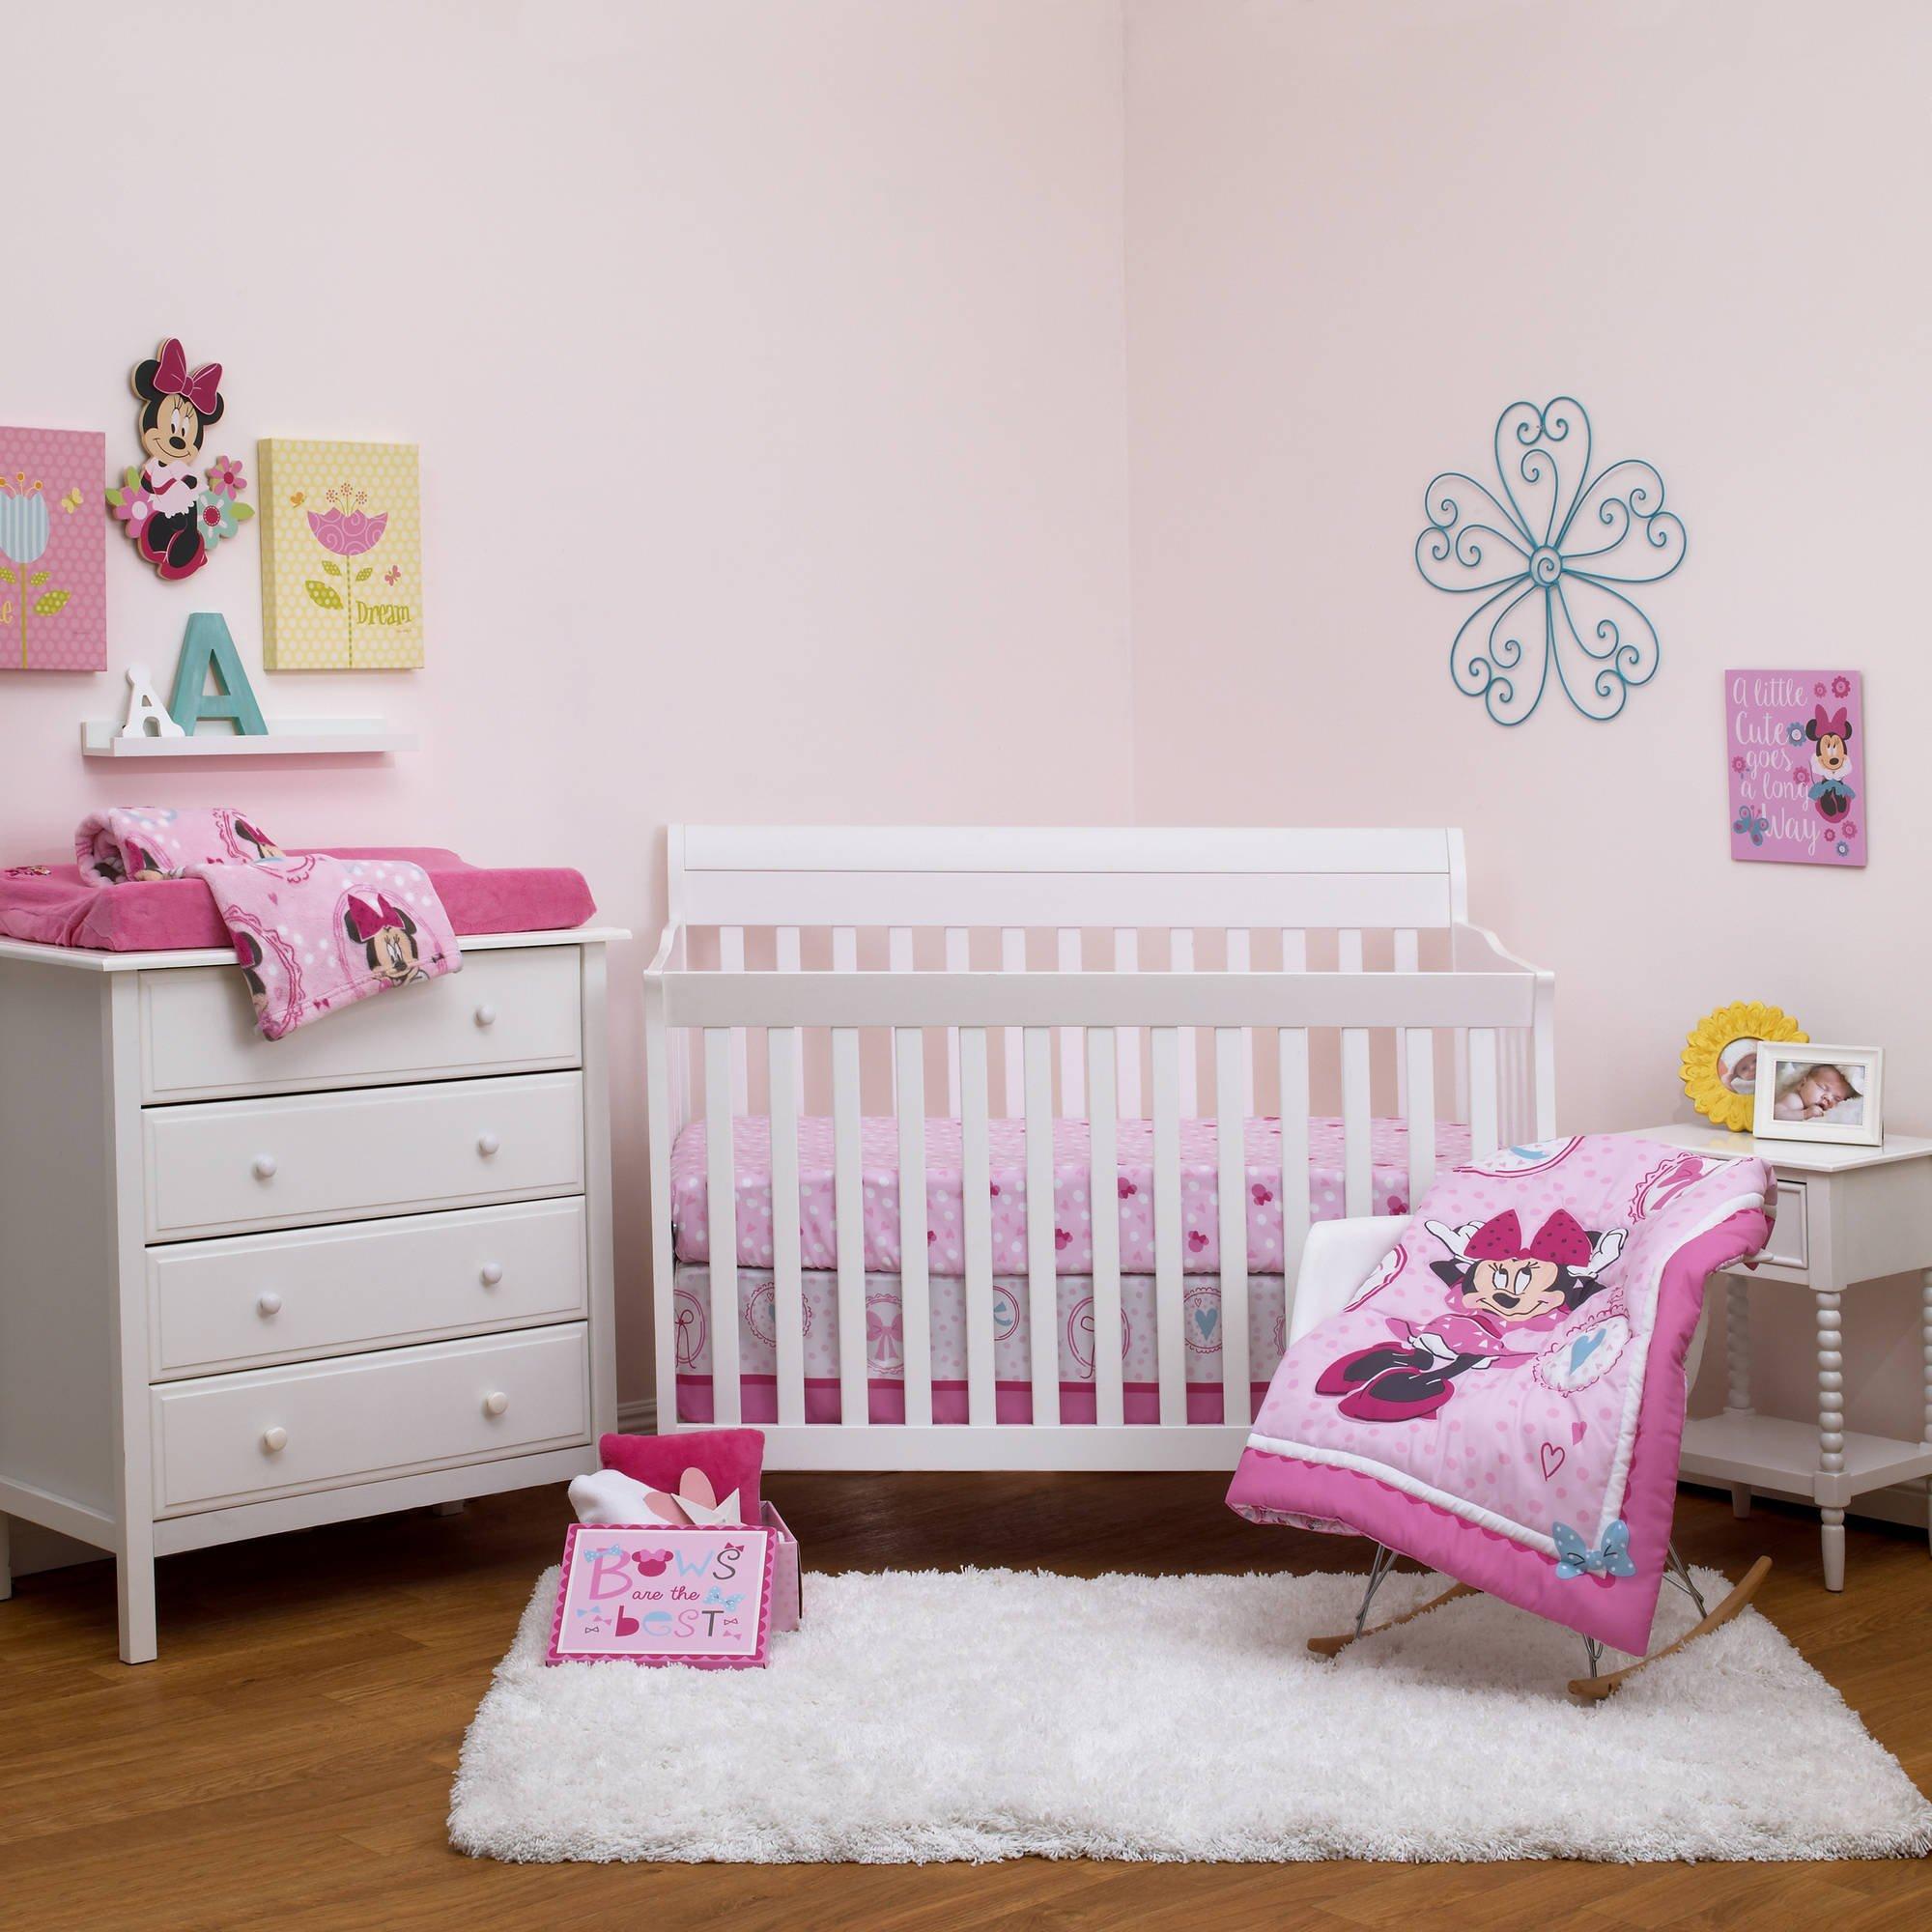 UK 4 Piece Pink Blue Girls Baby Minnie Mouse Crib Bedding Set, Newborn Disney Themed Nursery Bed Set Infant Child Animals Cartoon Animation Bows Hearts Blanket Comforter Polka Dot Pattern, Polyester